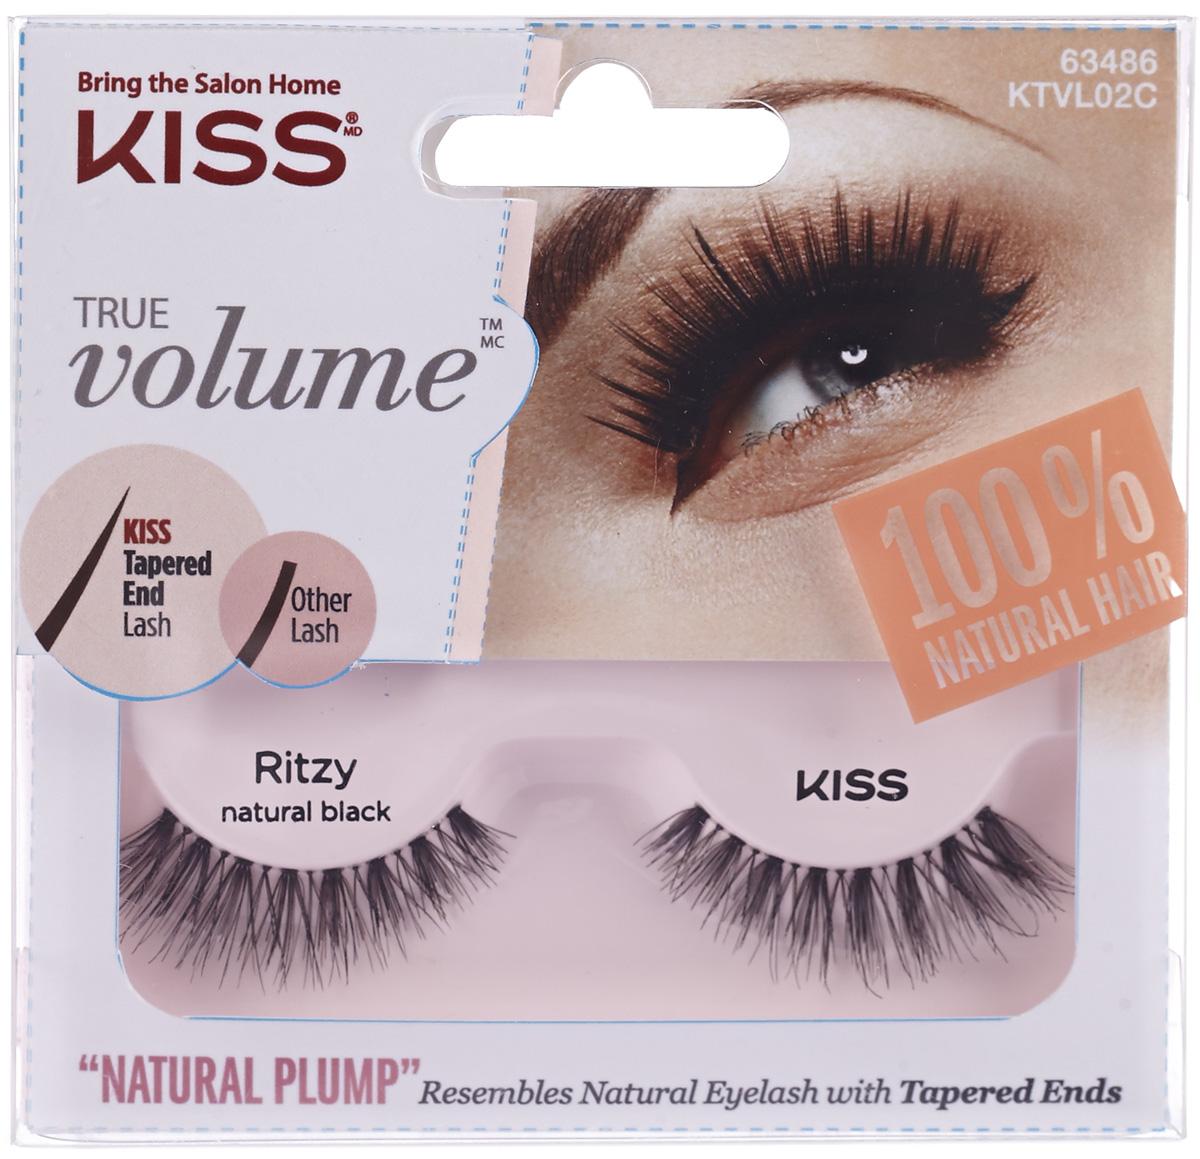 dff9cdd82 Kiss® - Umelé Mihalnice s lepidlom - Ritzy | Nails, Farebné UV Gély,  Mihalnice, Ardell | d-nails.sk